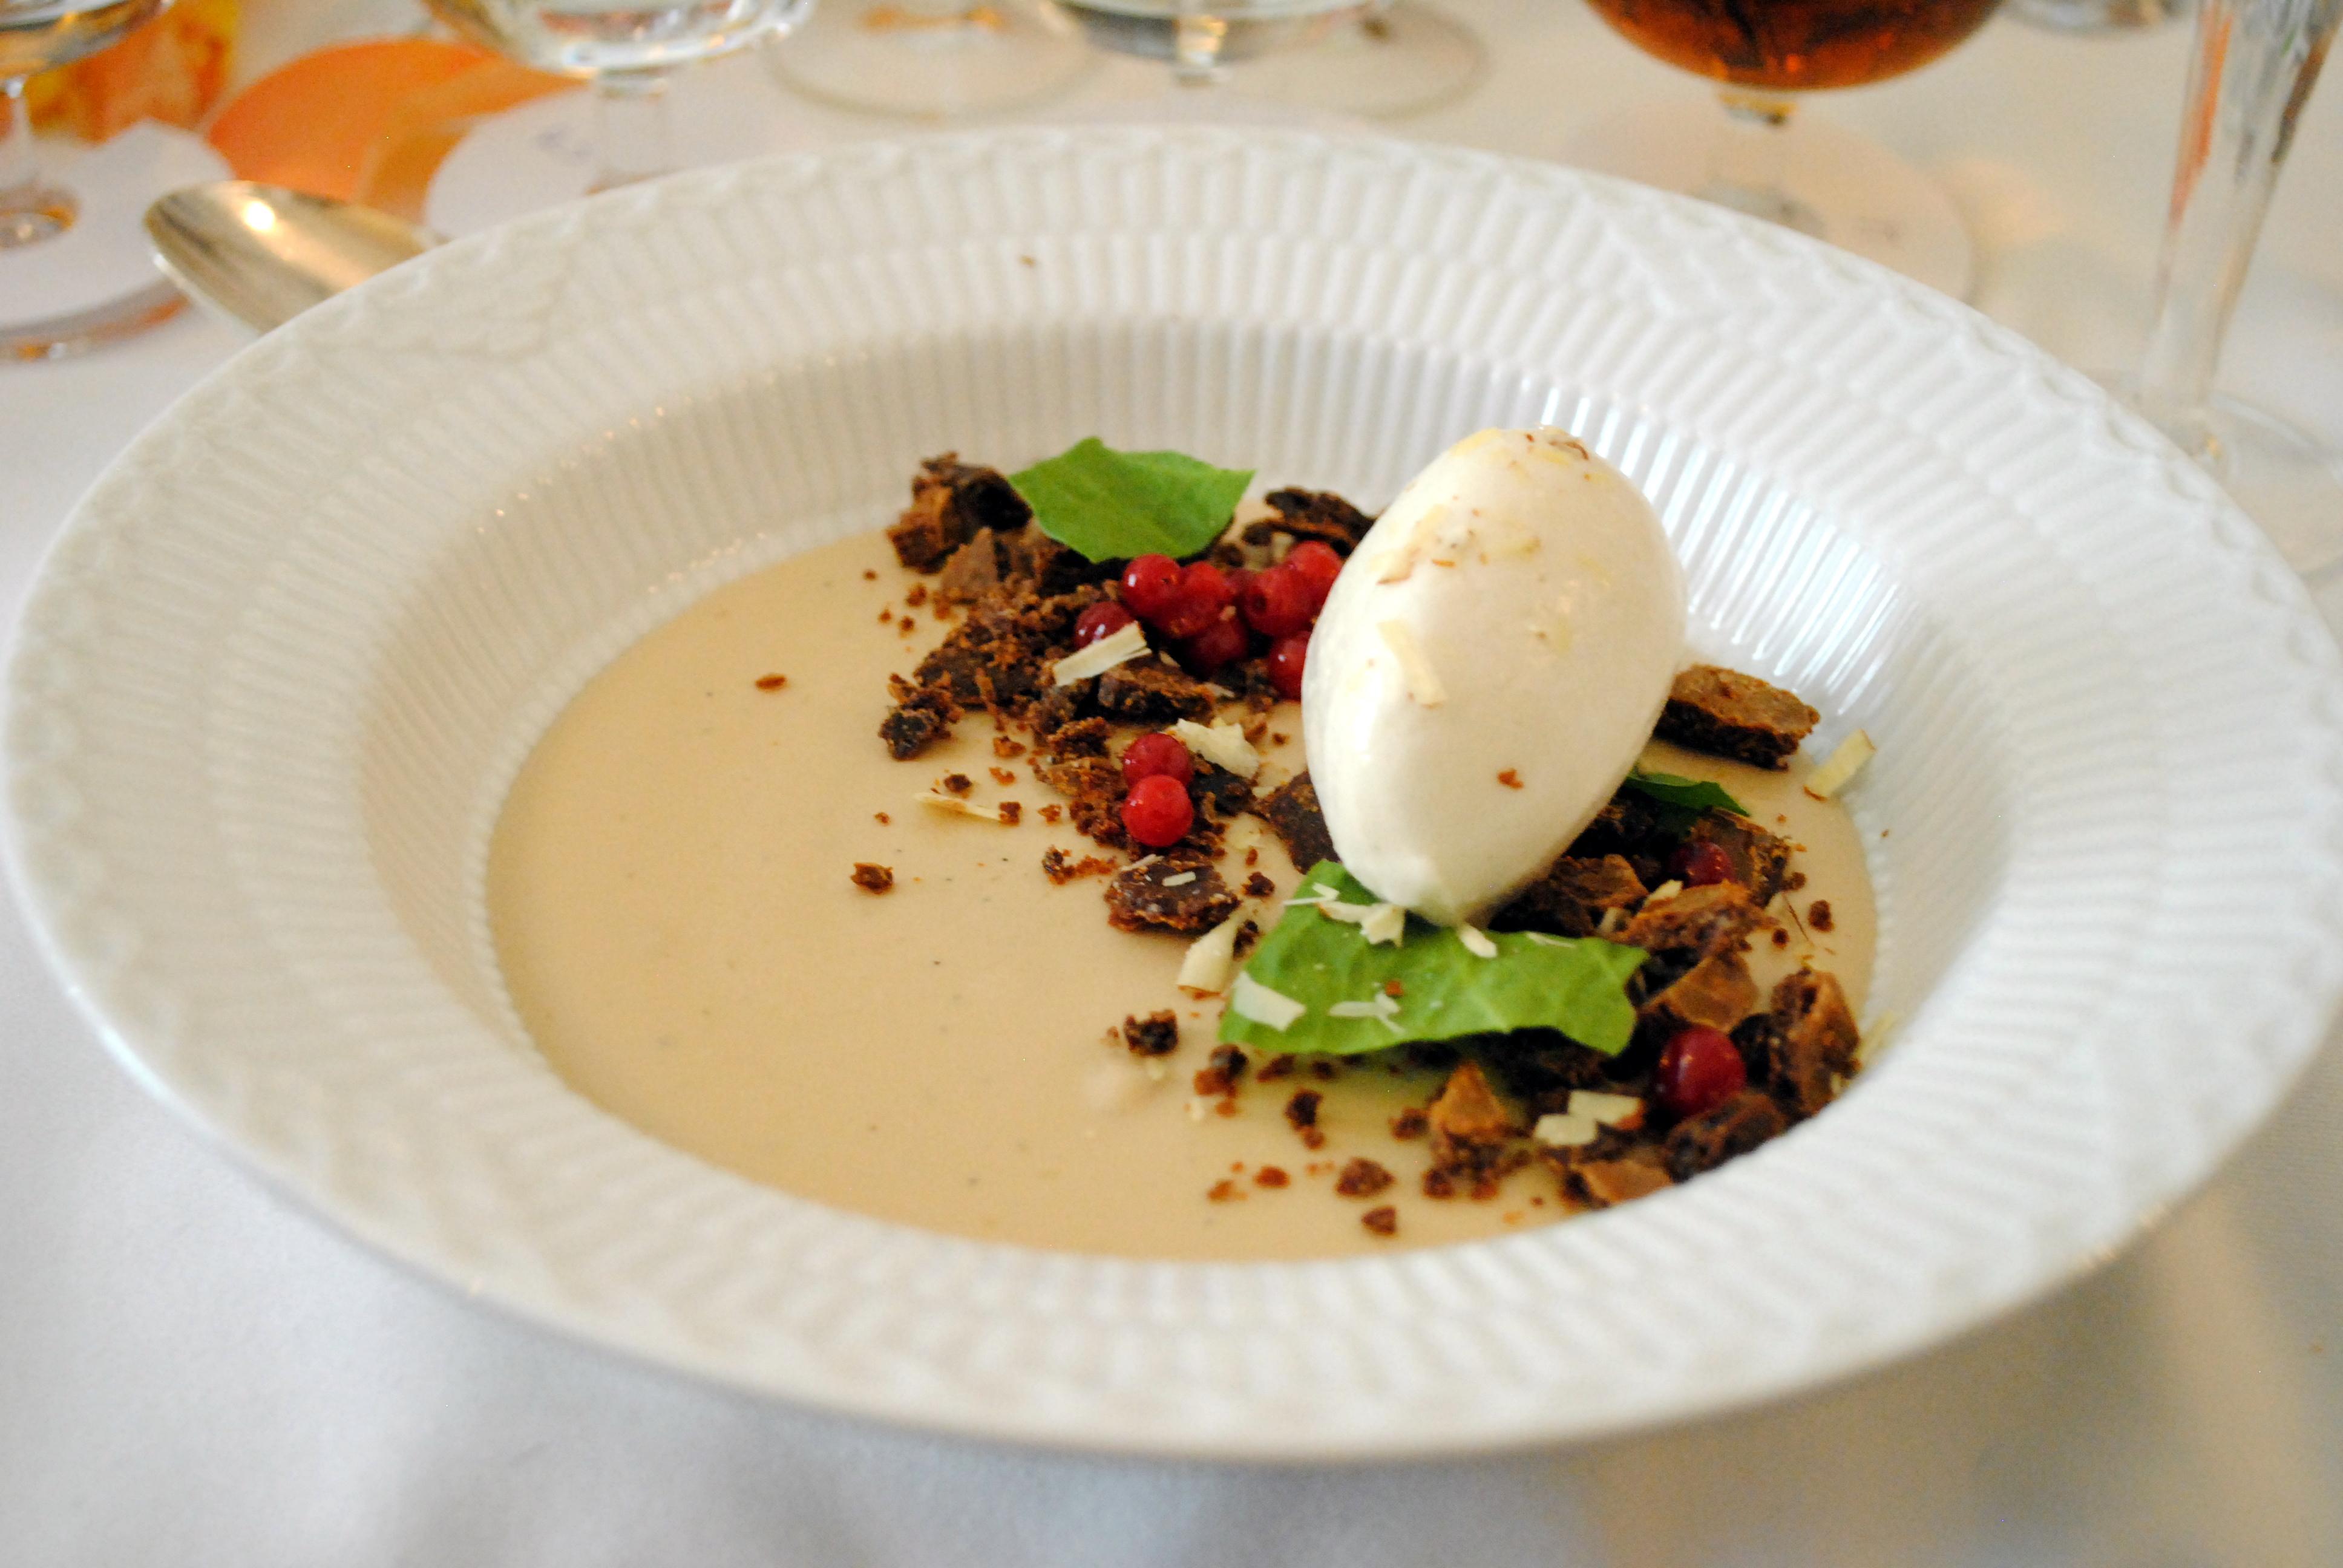 En dessert fra Krogs Fiskerestaurant med Aalborg Jubilæums Akvavit i, samt en lille konkurrence